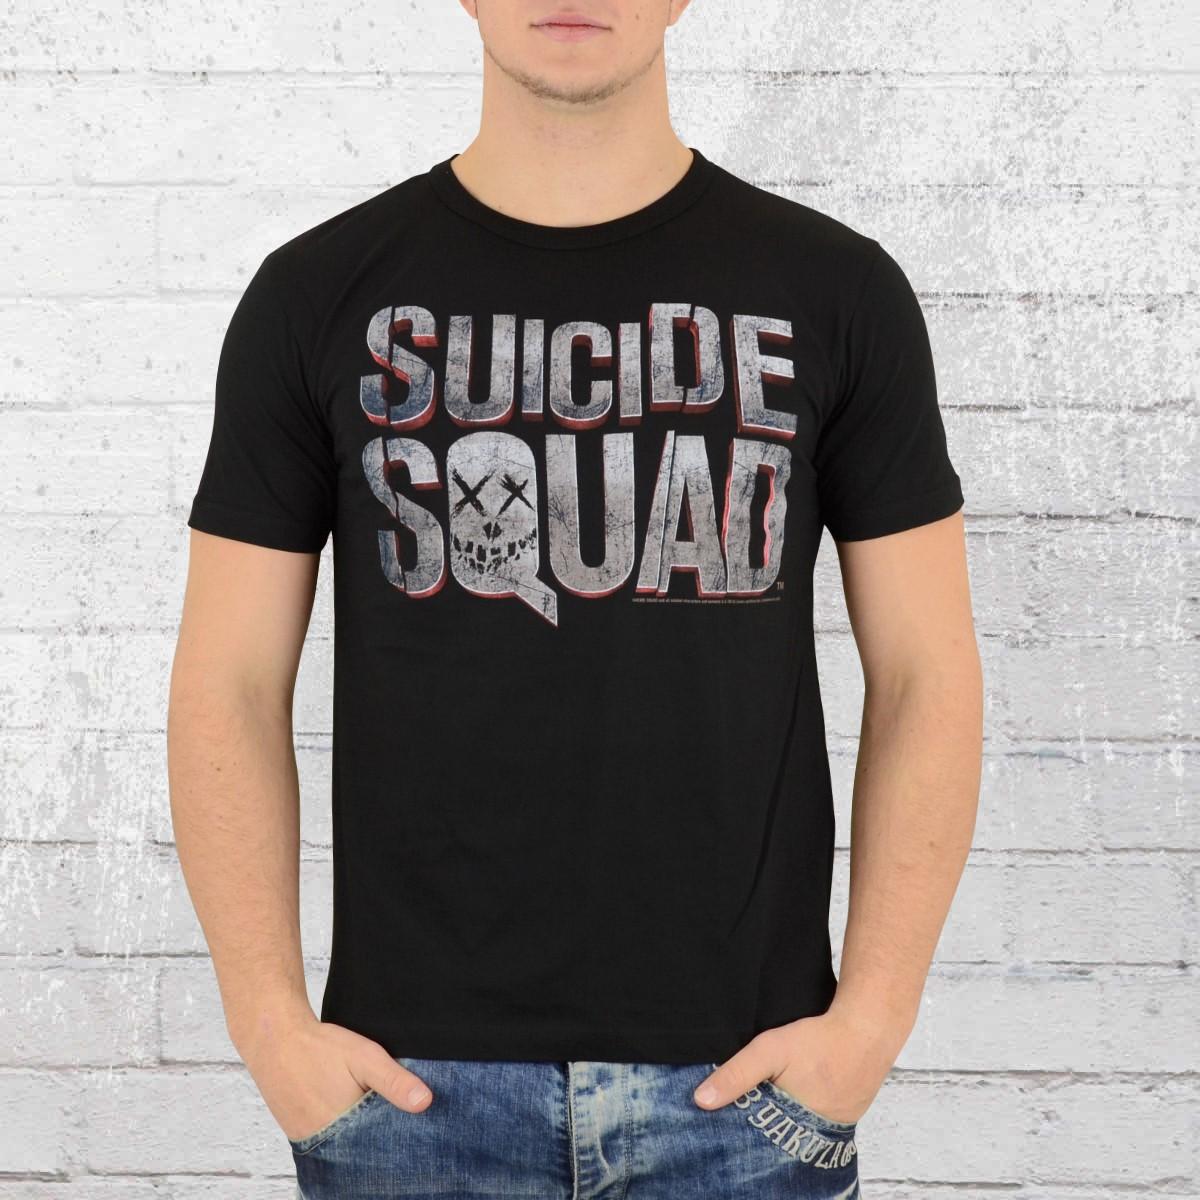 jetzt bestellen logoshirt t shirt m nner suizide squad. Black Bedroom Furniture Sets. Home Design Ideas